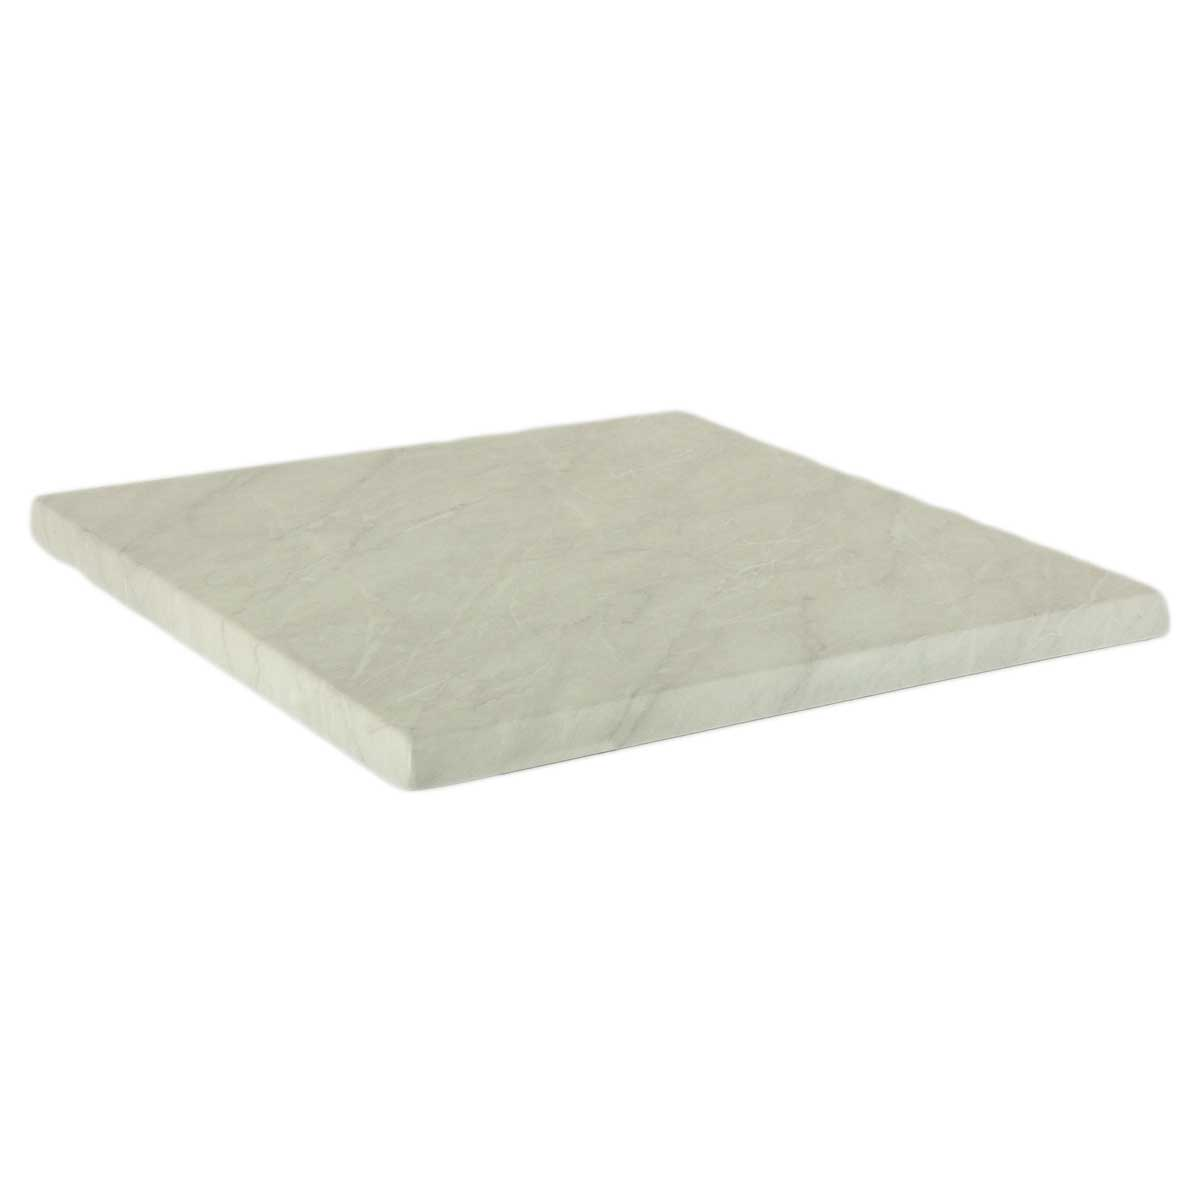 TICLA Q70 121 - https://www.werzalit.com/nl/product/tafelblad-classic-werzalit-q-70x70-121-marmor-de-genes/